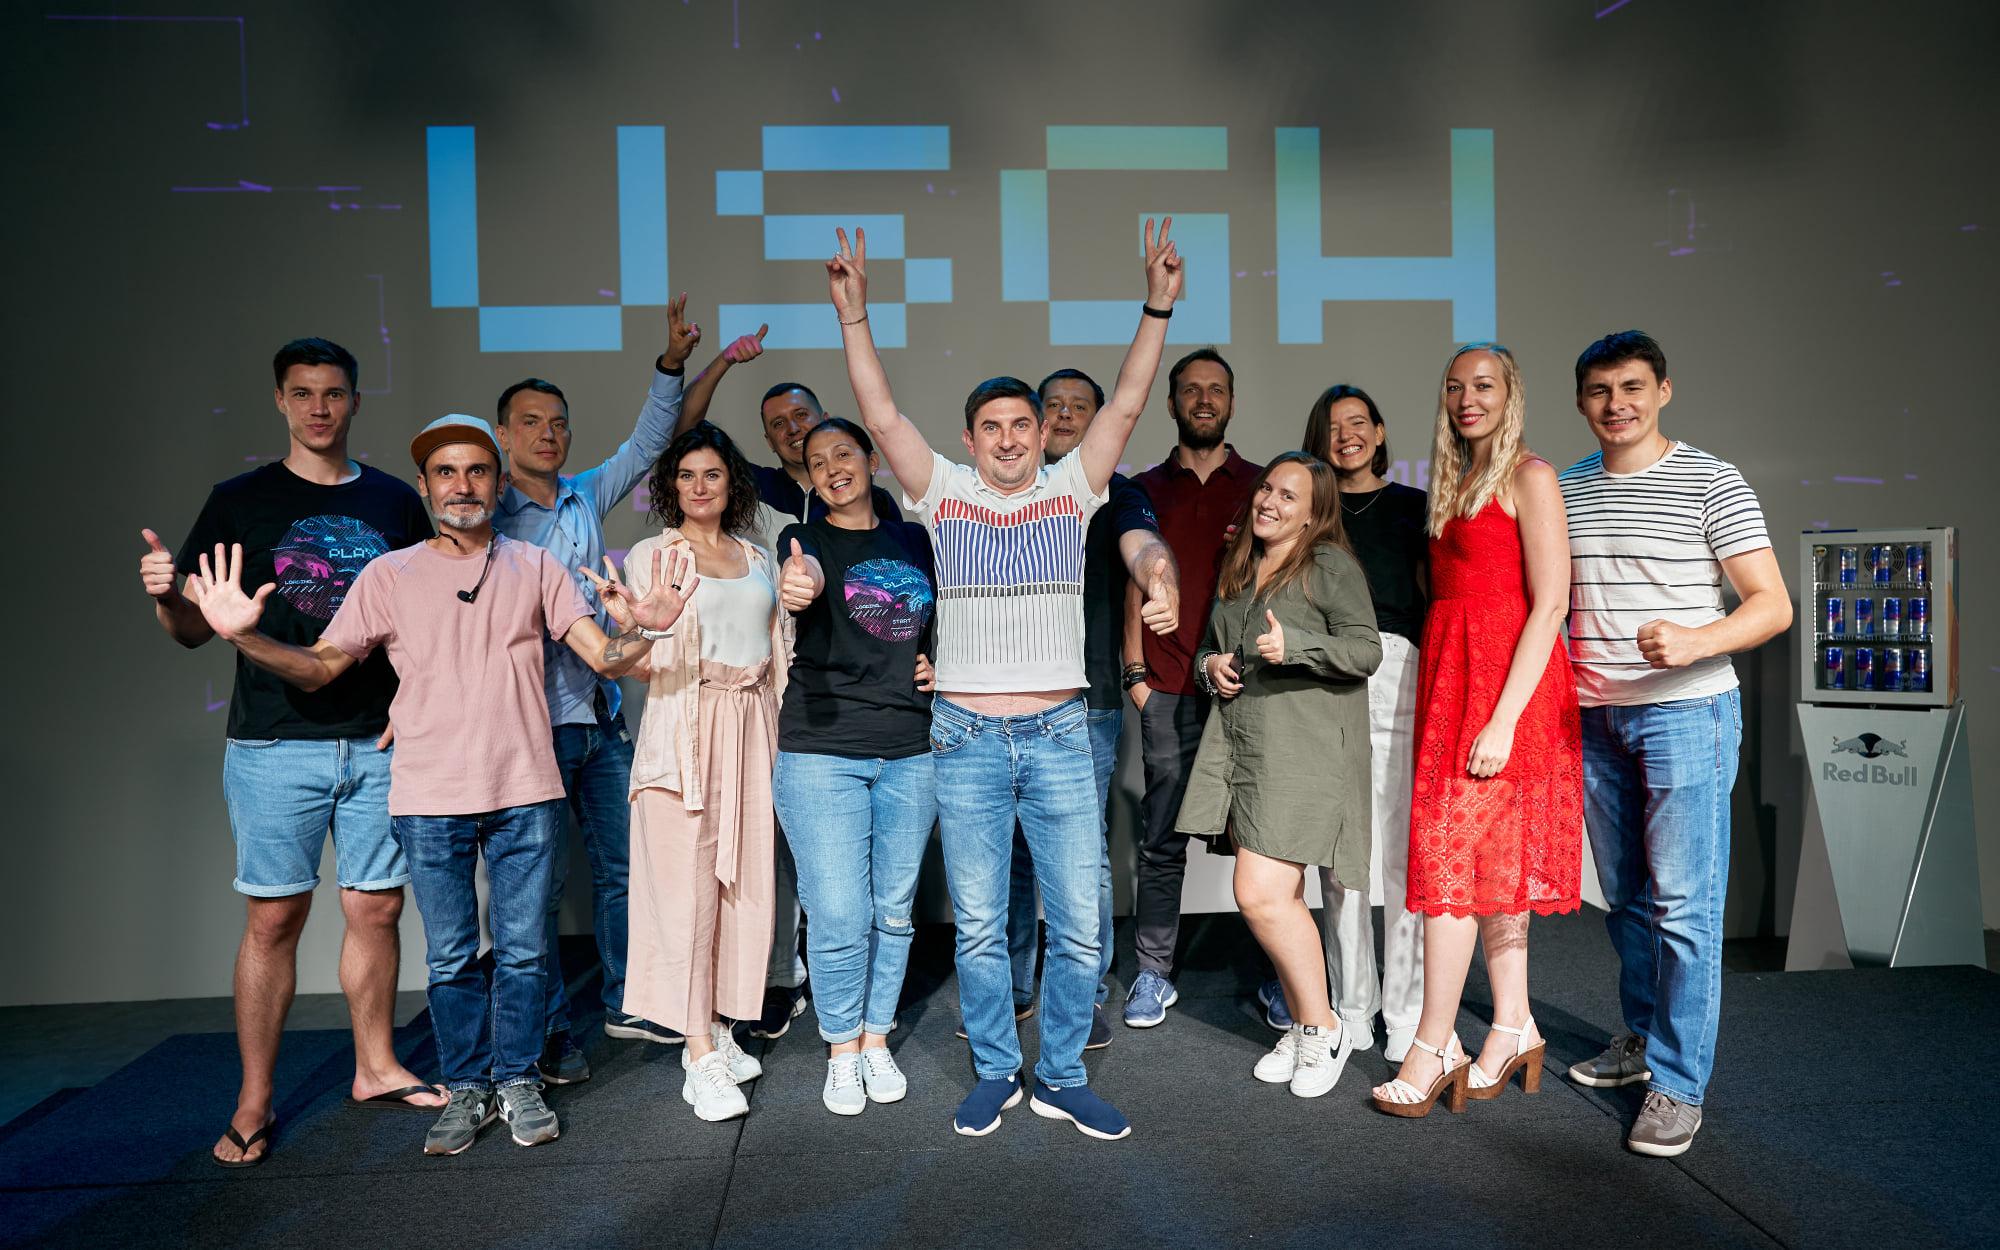 👨🏼💻 Стартує другий онлайн-хакатон Universal Sports and Games Hackathon — призовий фонд в $6000